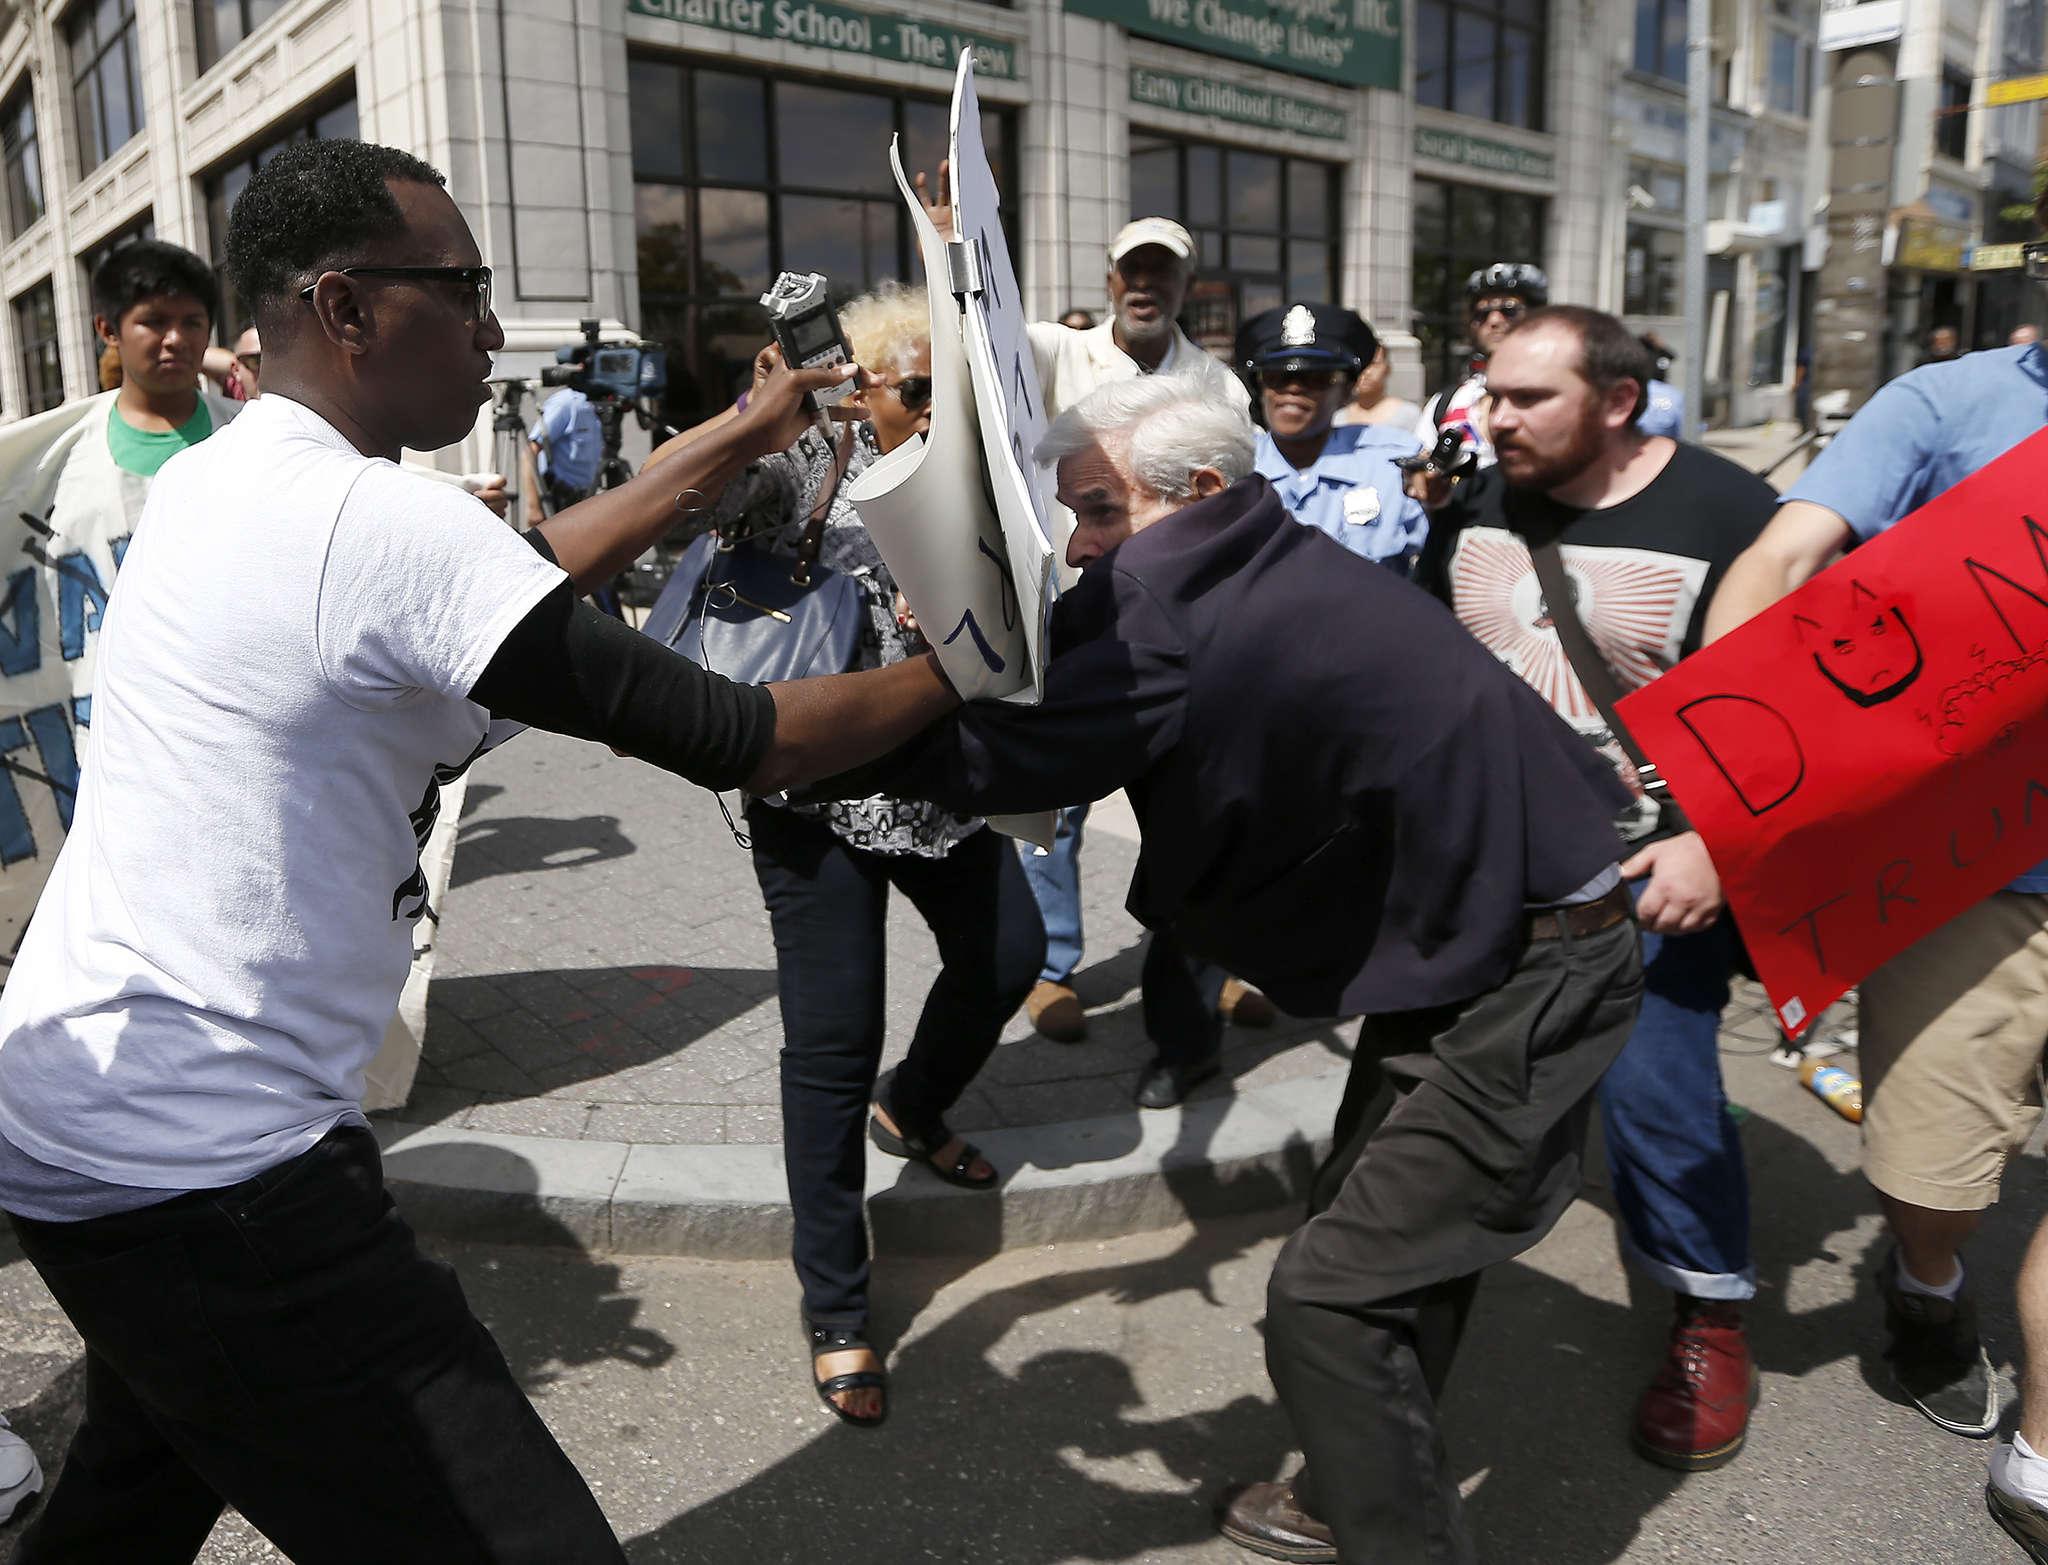 Protester Asa Khalif (left) and Donald Trump supporter Jerry Lambert scuffling Friday in Philadelphia.